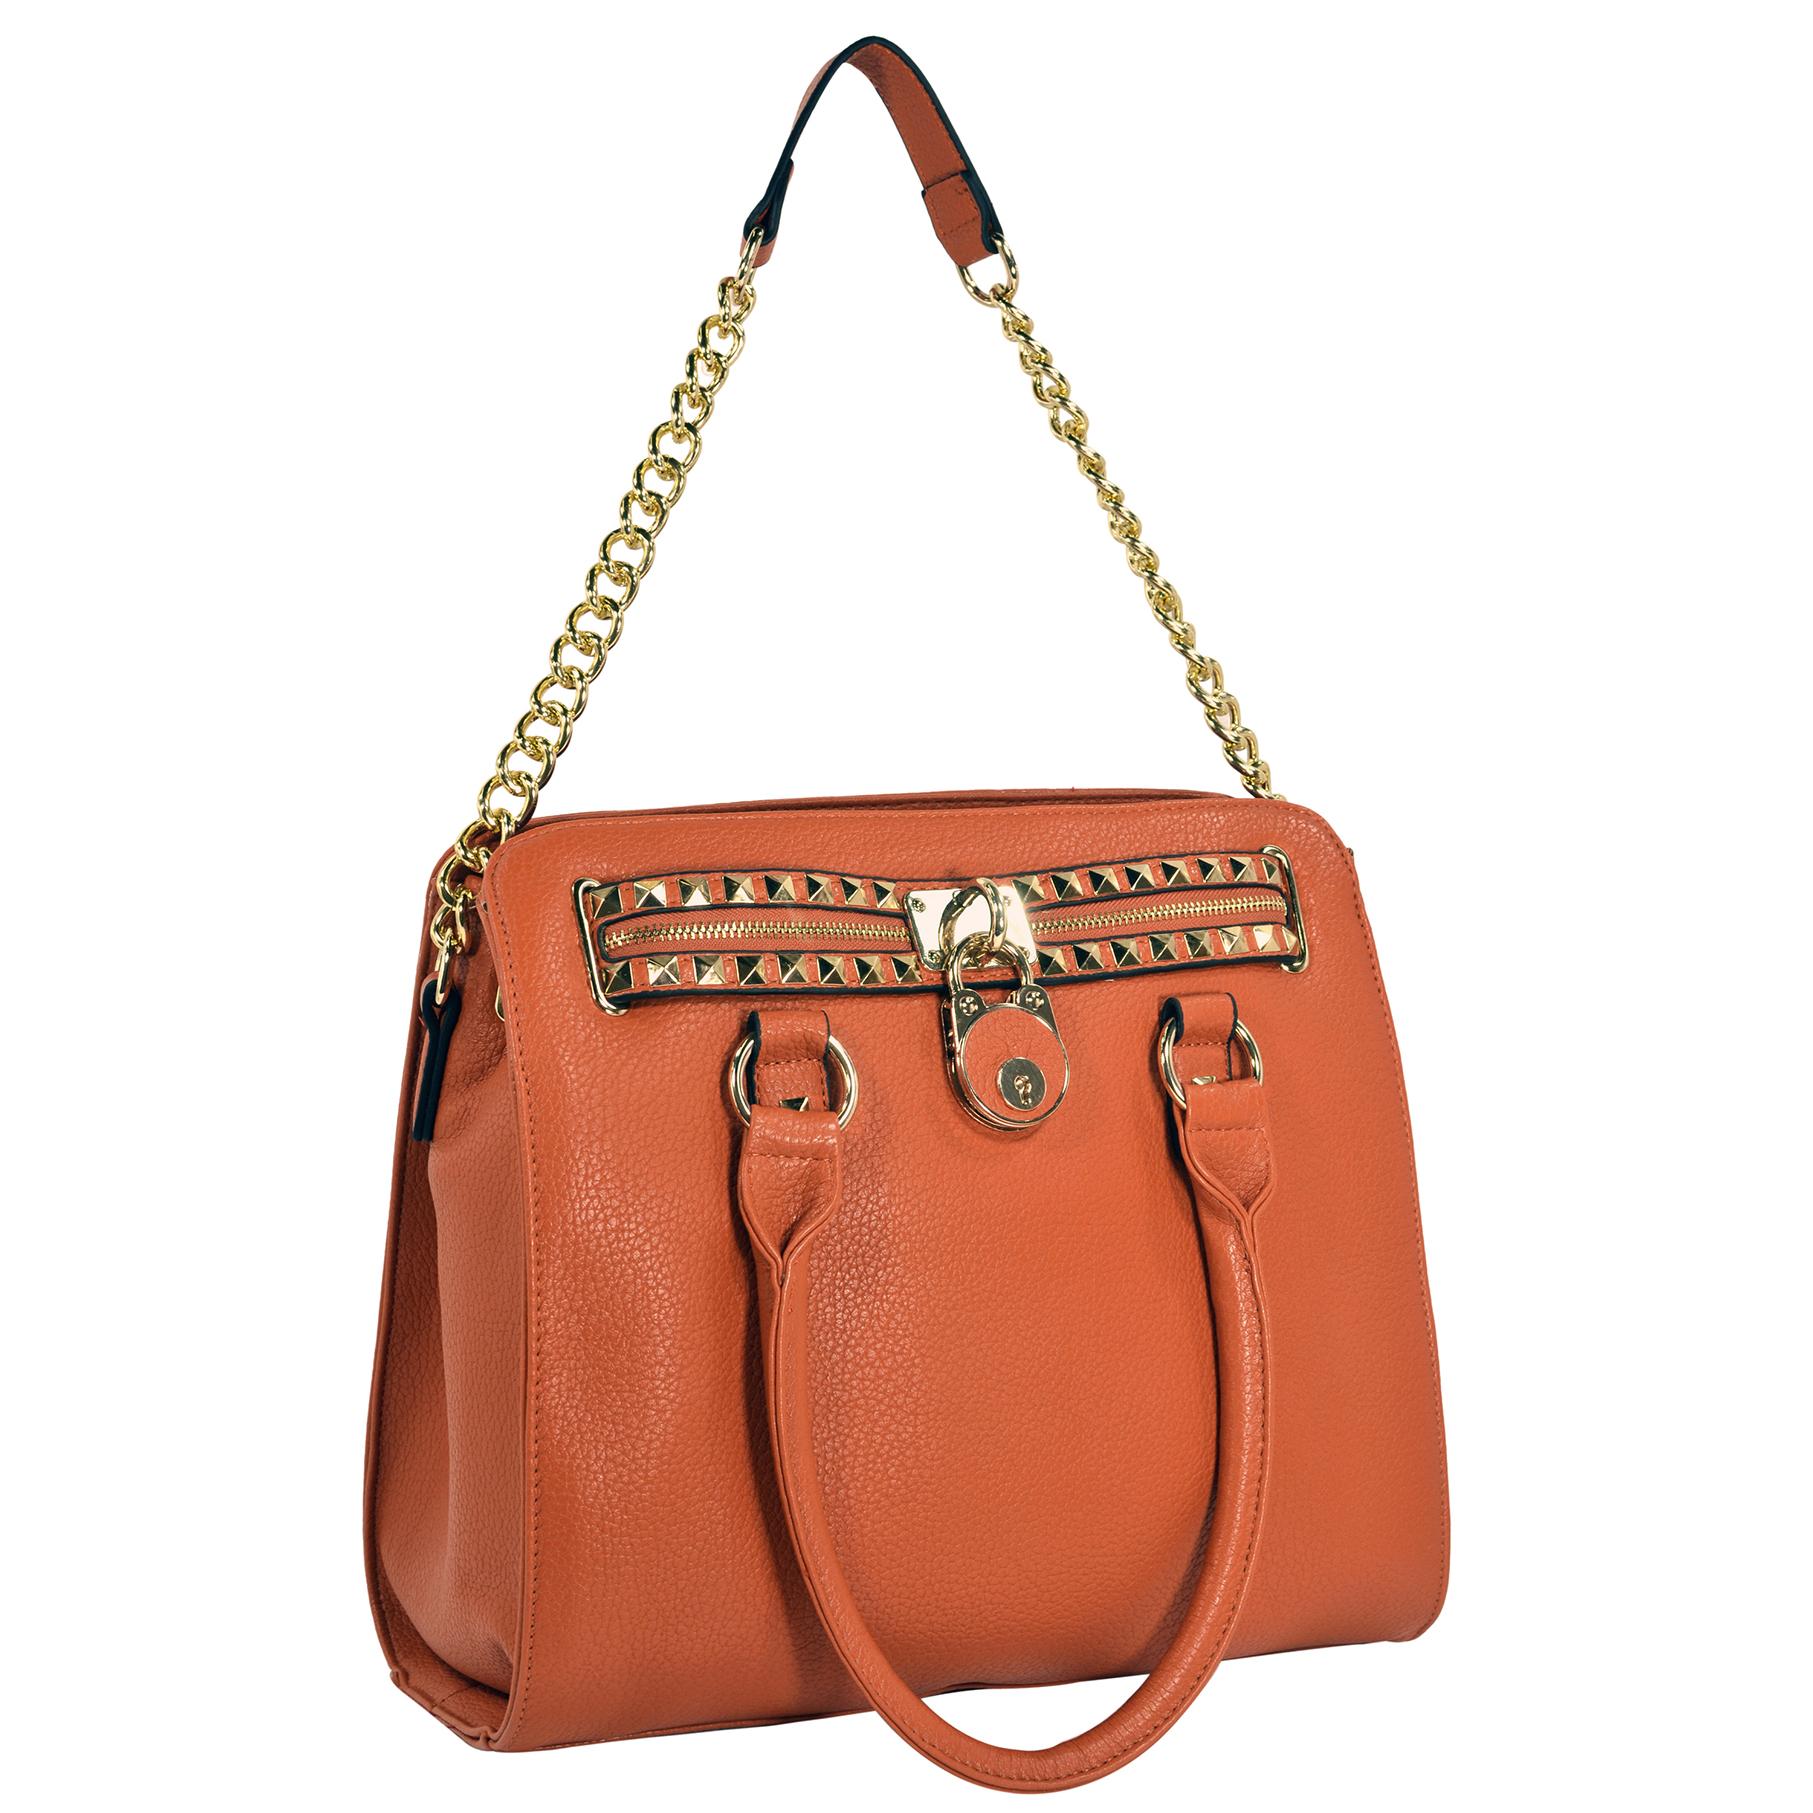 HALEY Orange Bowler Style Handbag handle